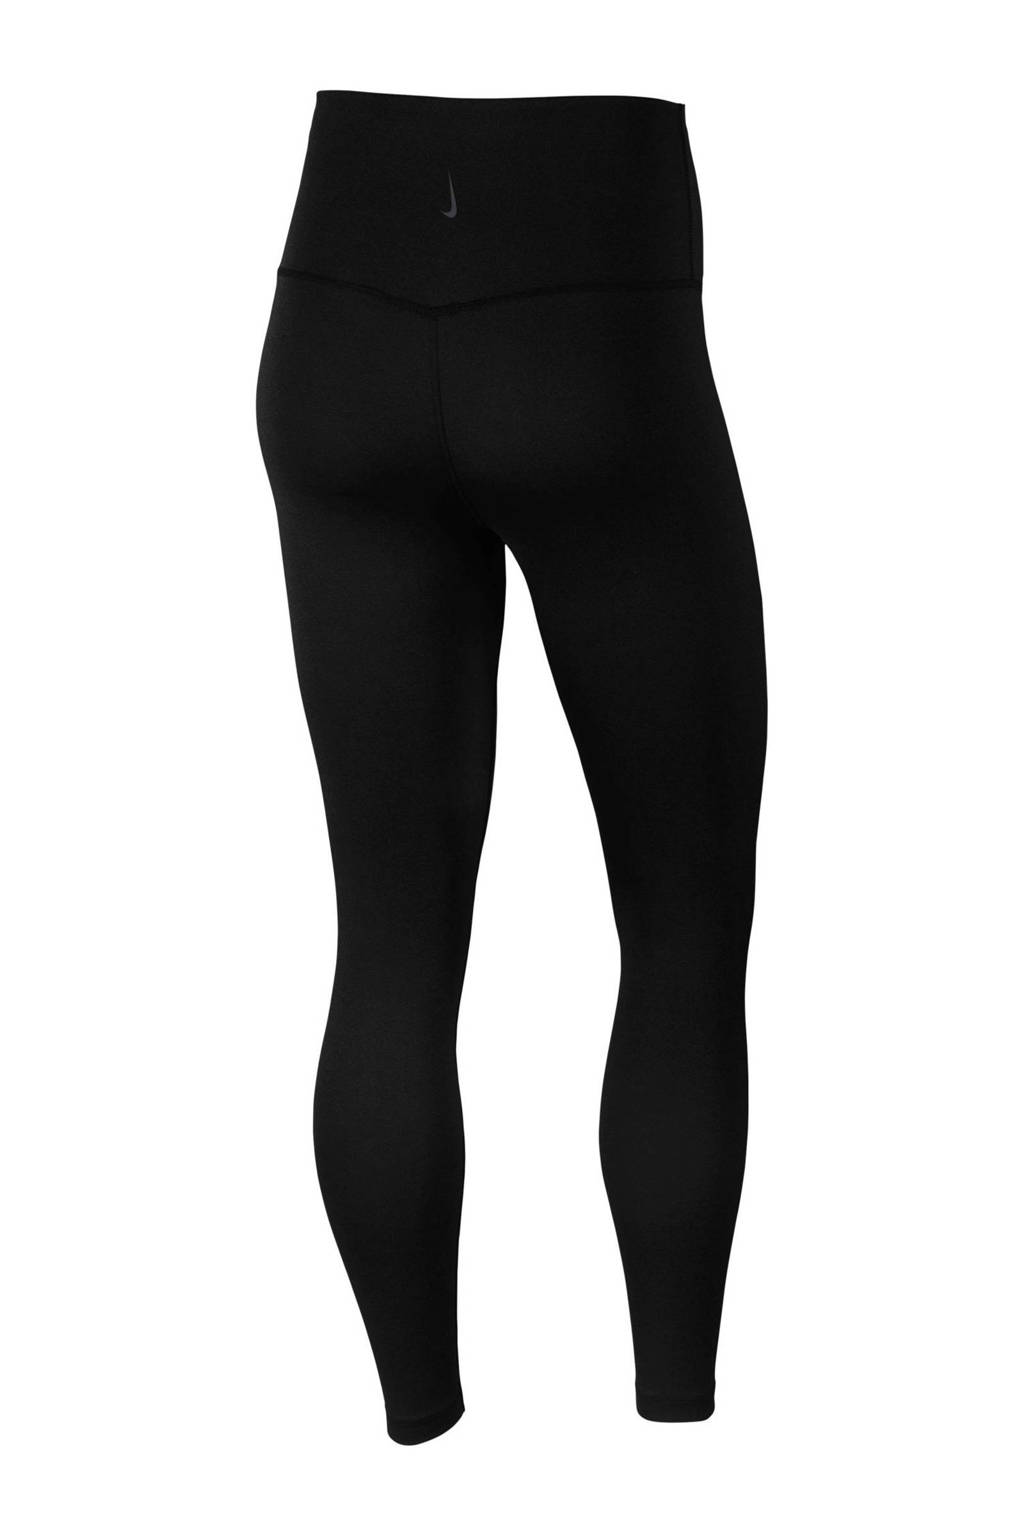 Nike 7/8 sportbroek zwart, Zwart/donkergrijs